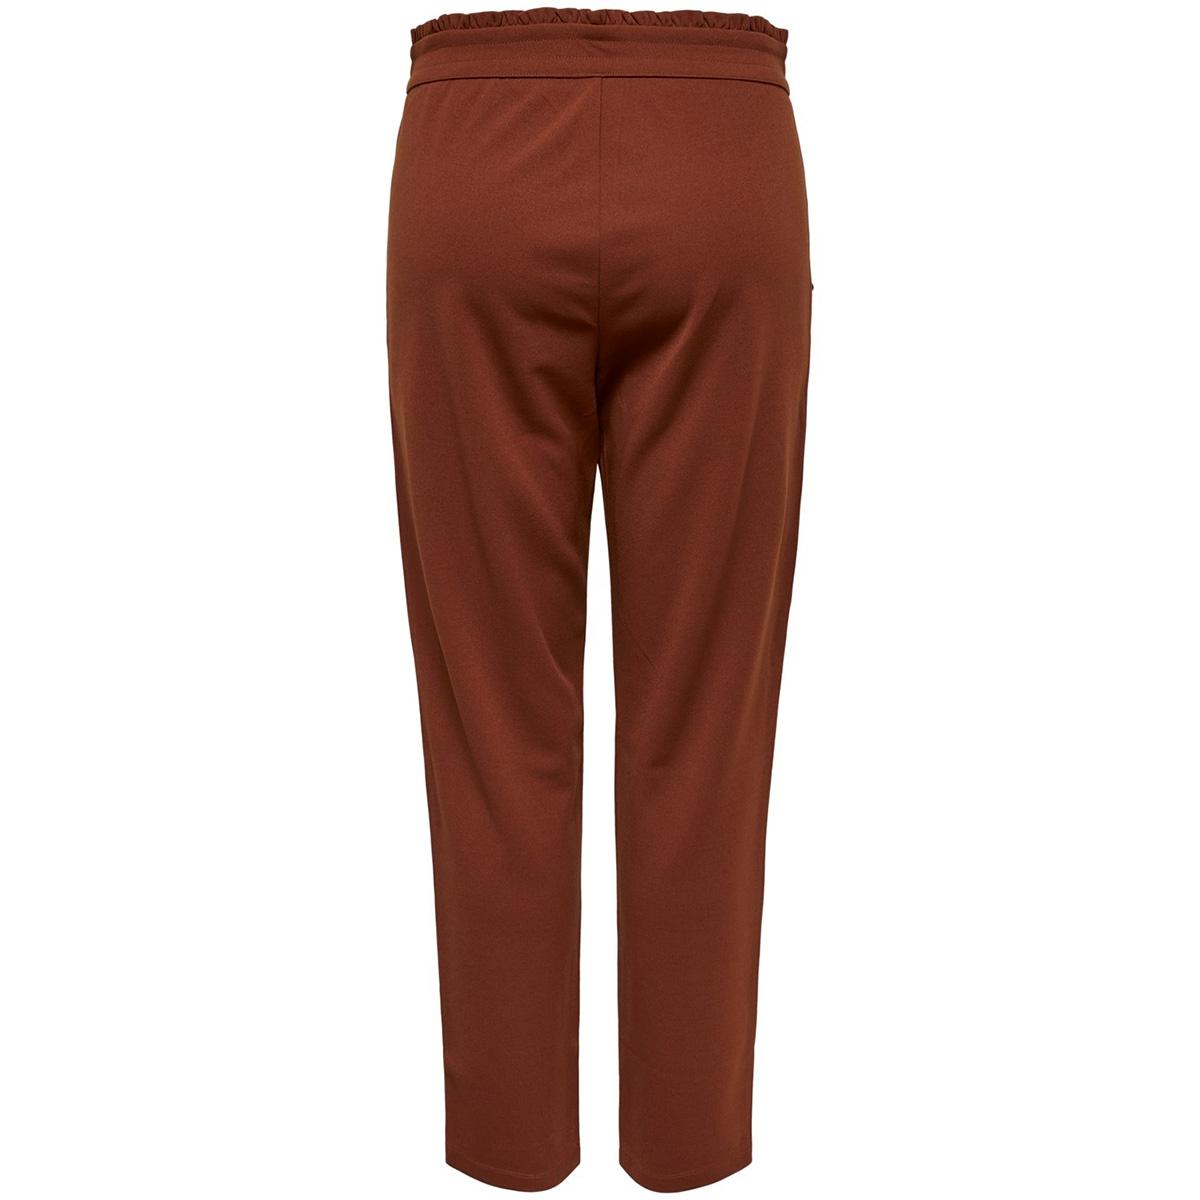 jdycatia pants jrs noos 15152796 jacqueline de yong broek smoked paprika